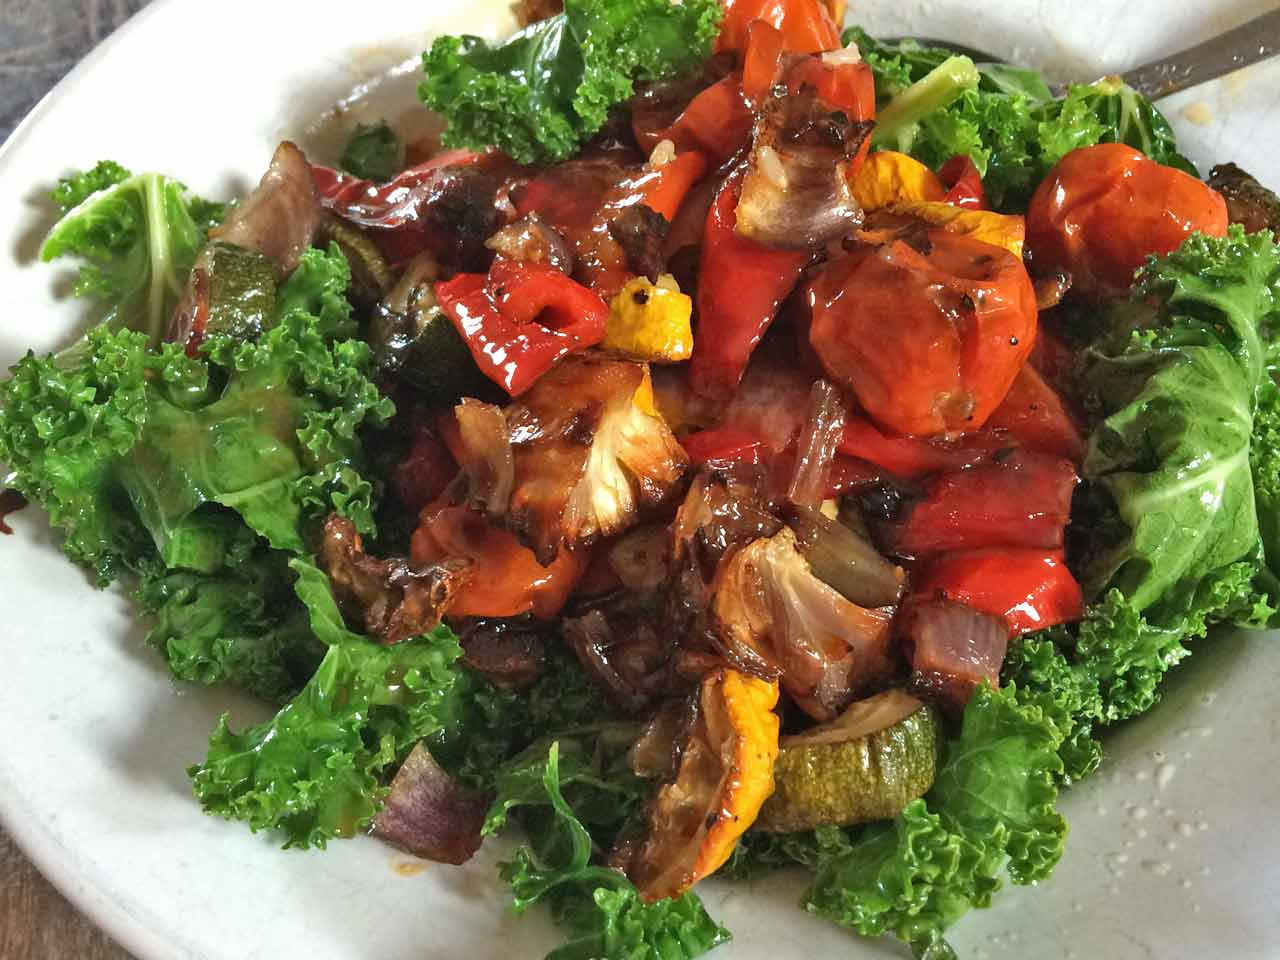 Stir-fried kale with mixed roasted vegetables - Saga